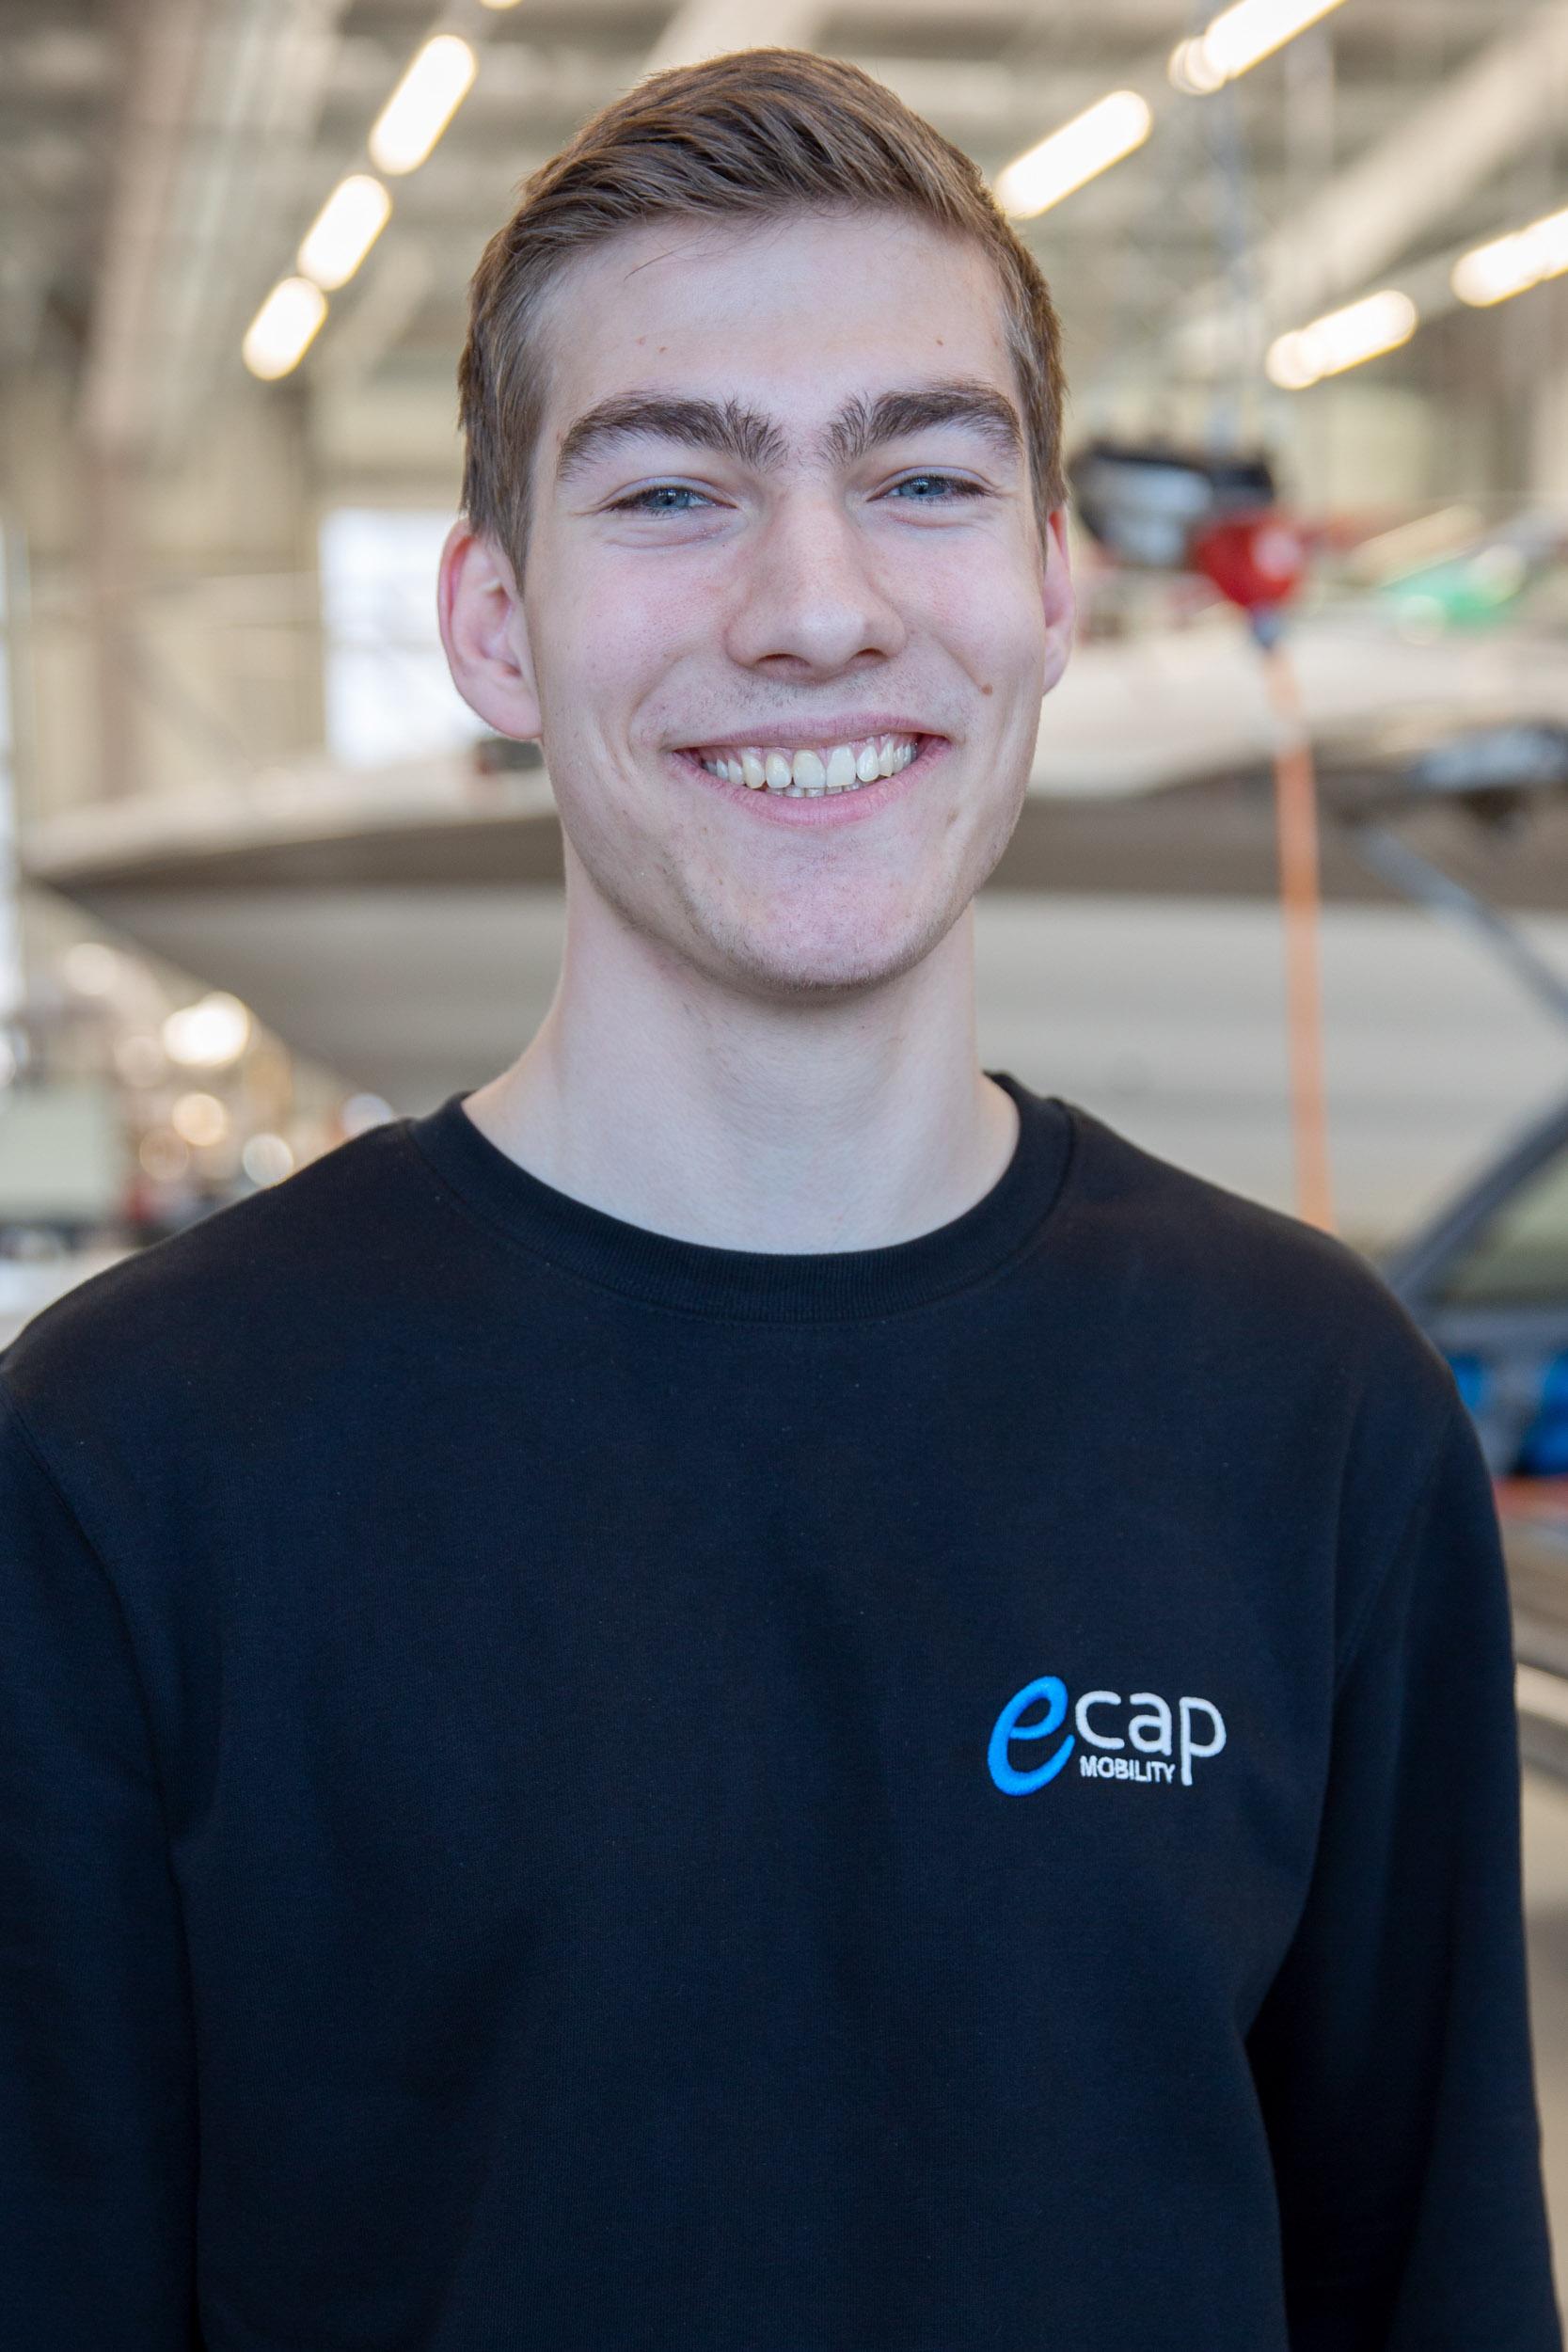 Pascal Busch | Kfz-Mechatroniker  pbu@ecap-mobility.com